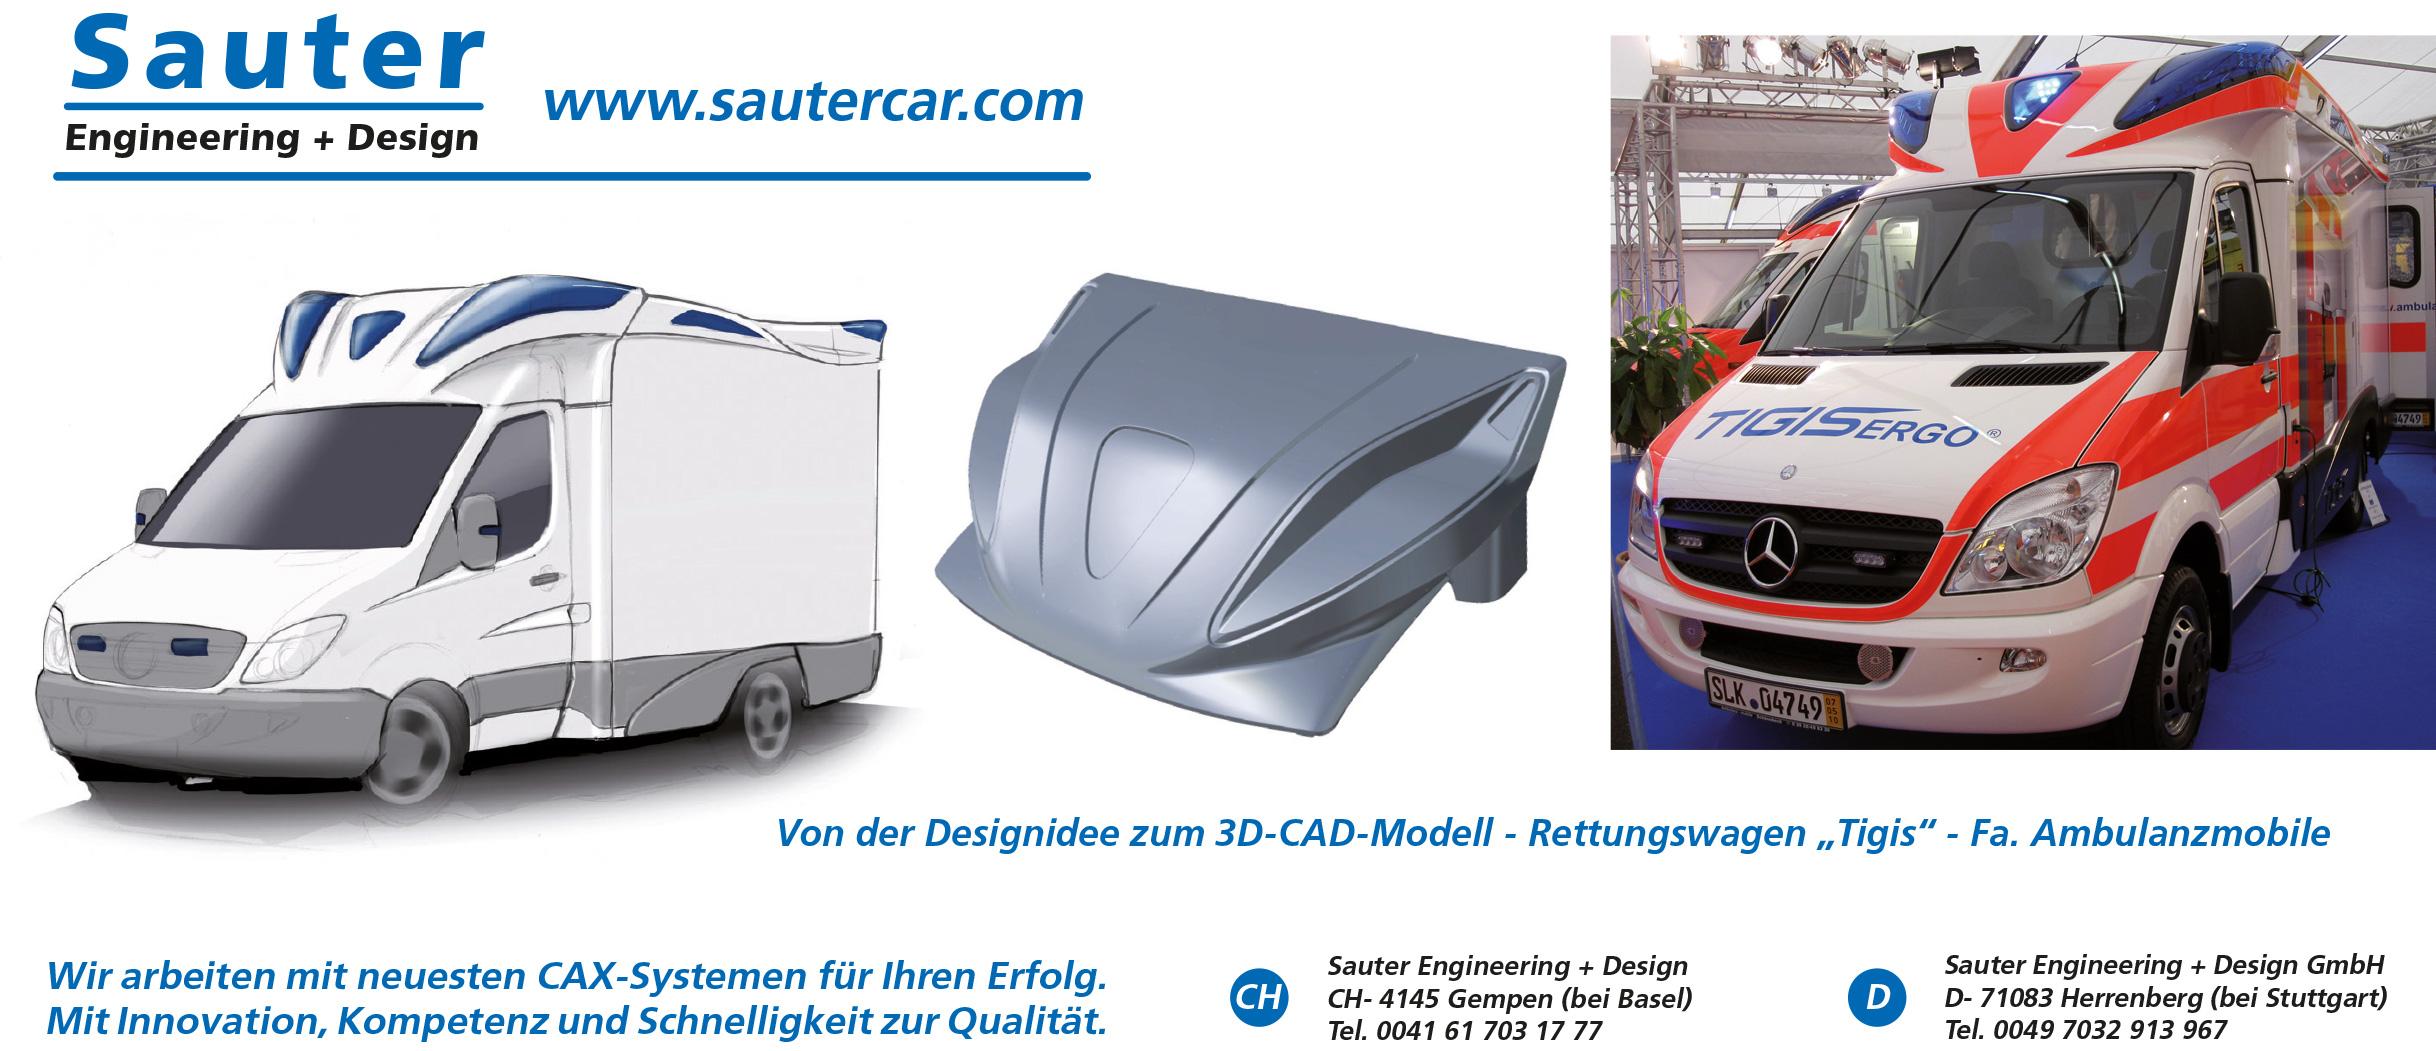 Beispielprojekt-TIGIS-Sauter-Catia-ICEM-Surf-3D-Scannen-Engineering-Schweiz-Deutschland-1